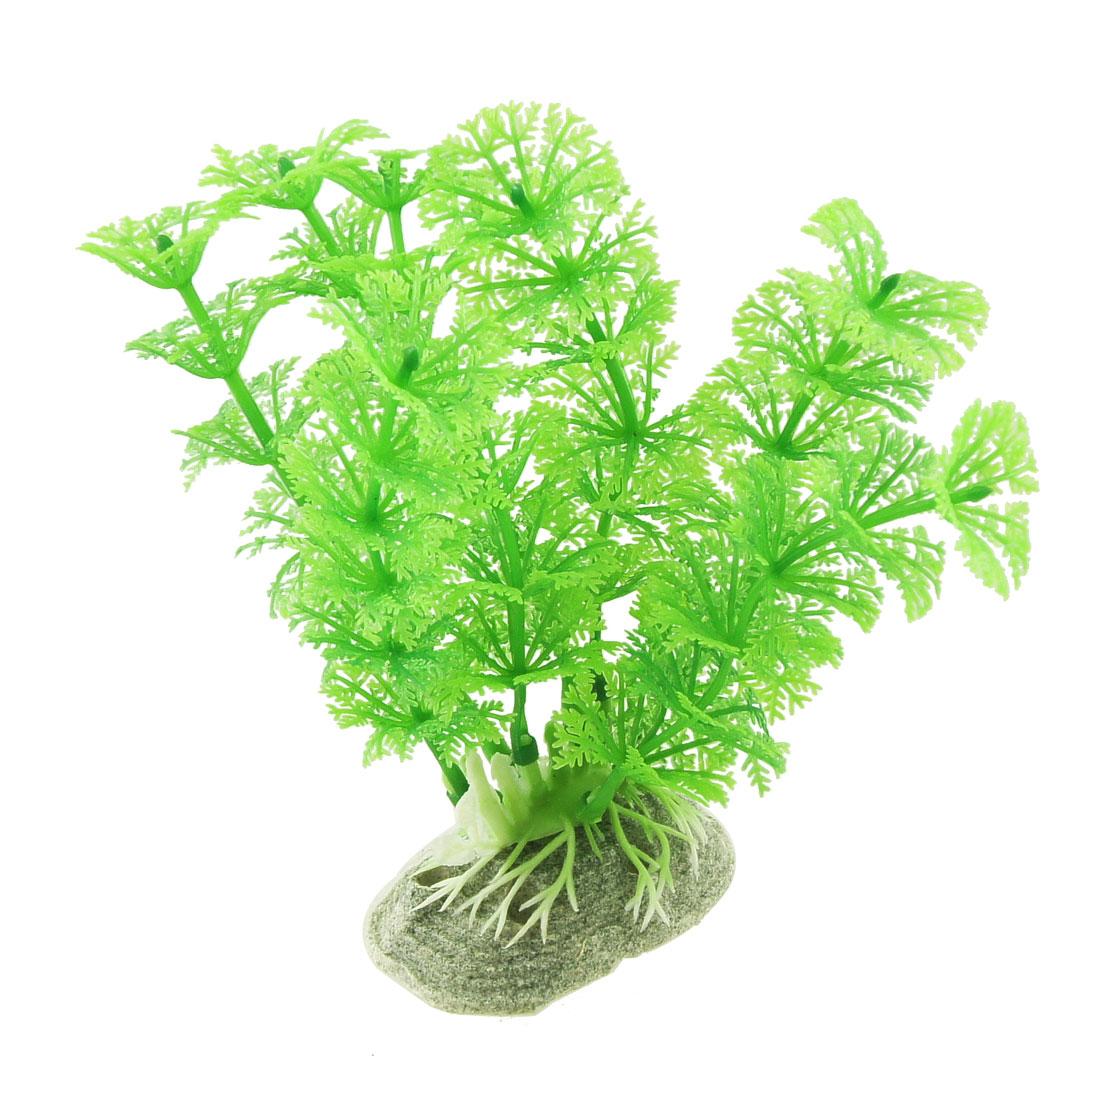 "Fish Tank 5"" Emulational Underwater Plant Grass Decor Green"